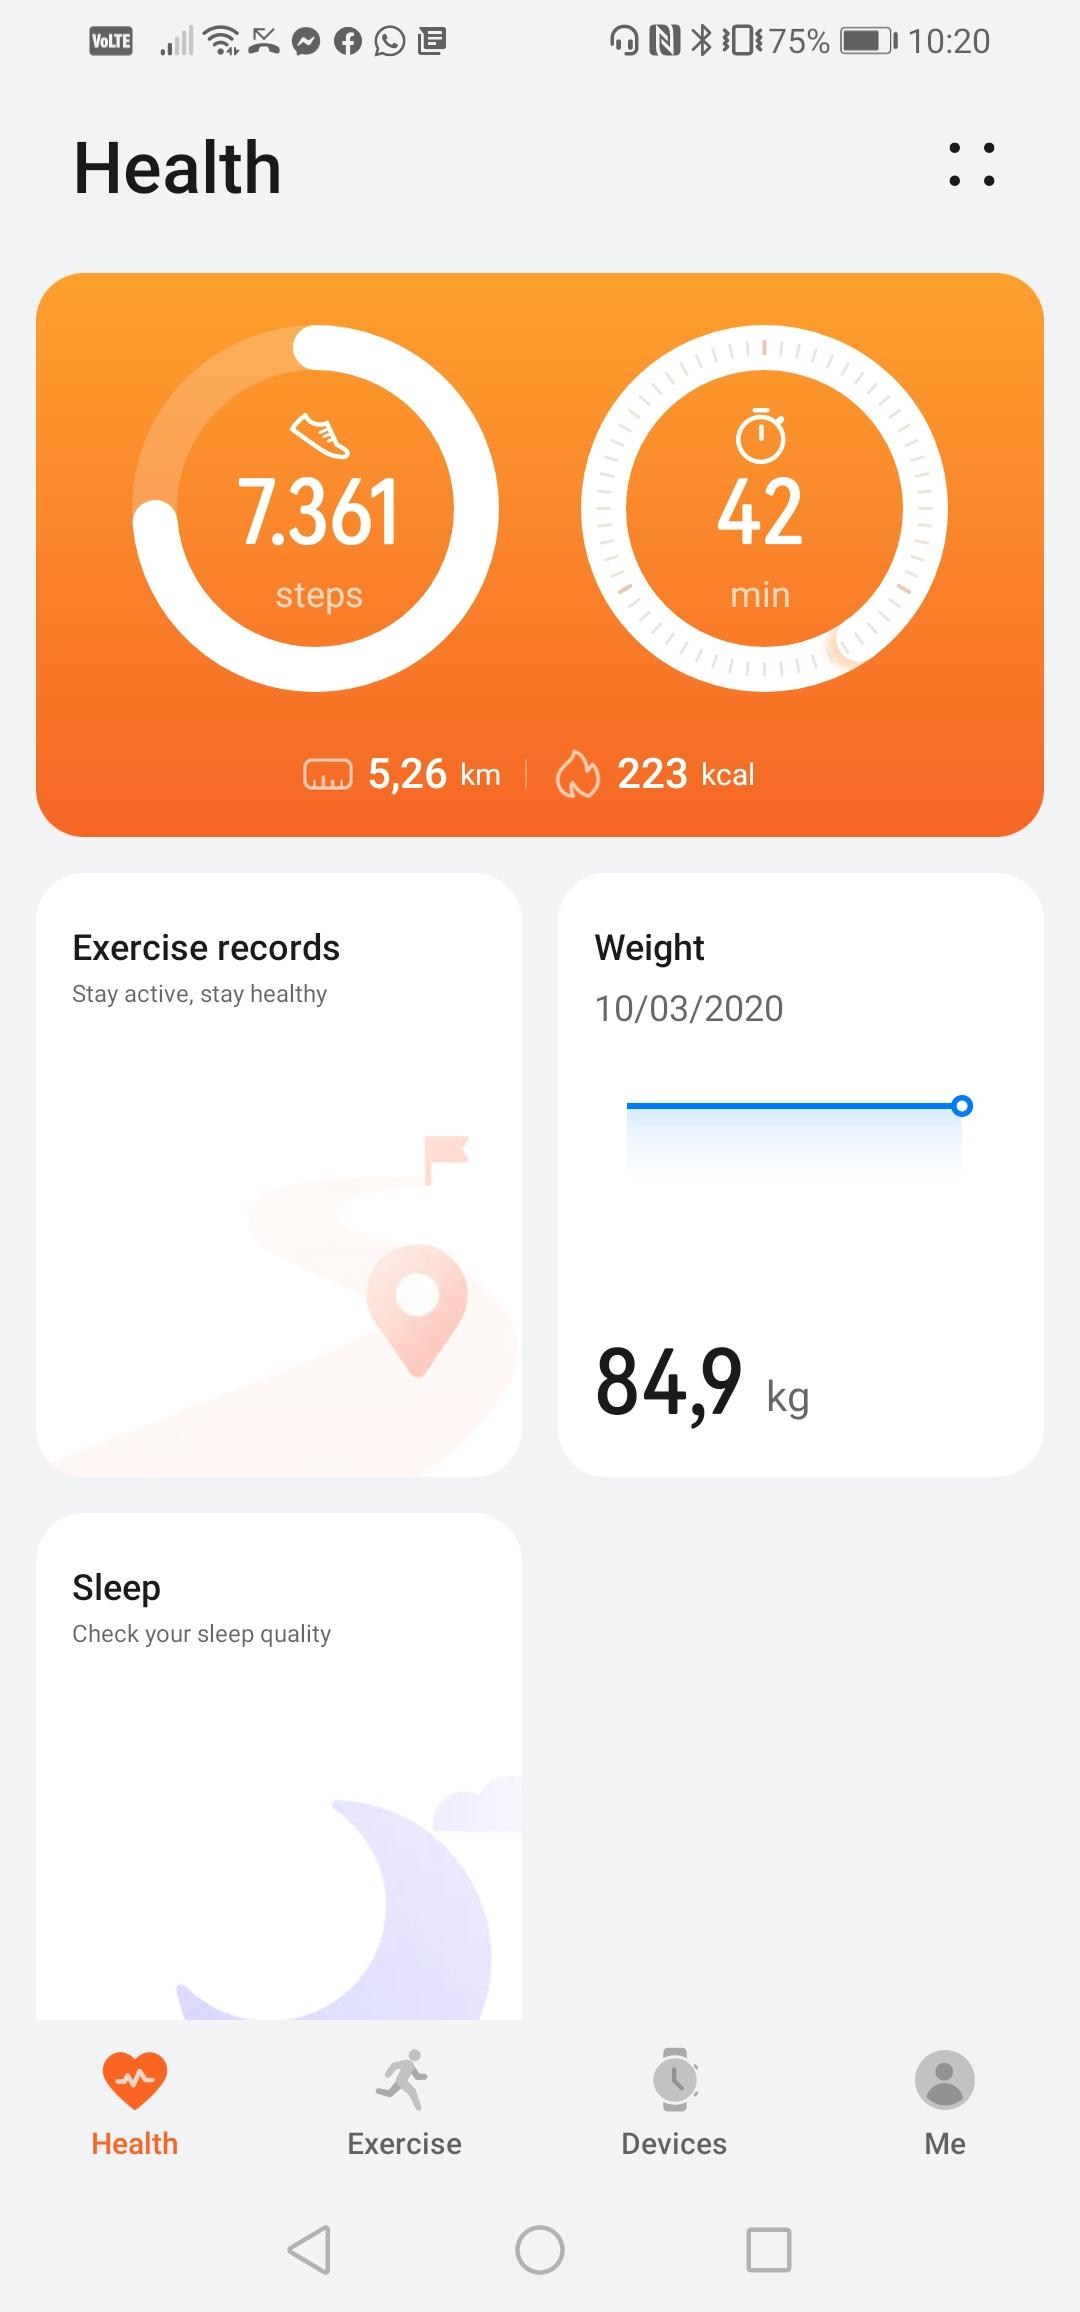 screenshot_20210510_102002_com-huawei-health